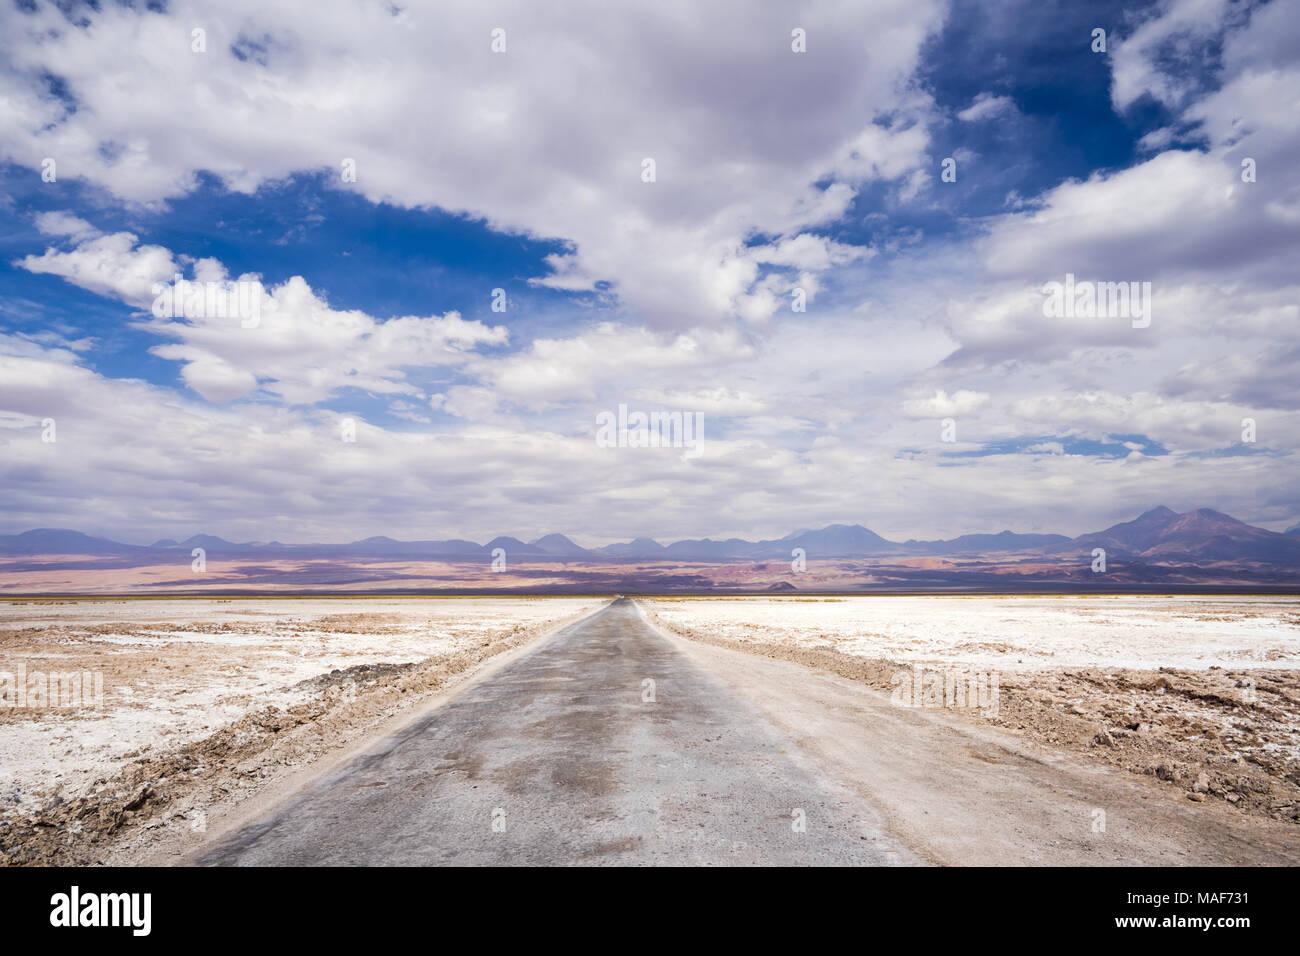 Salar de Atacama, Antofagasta, Chile, southamerica - Stock Image